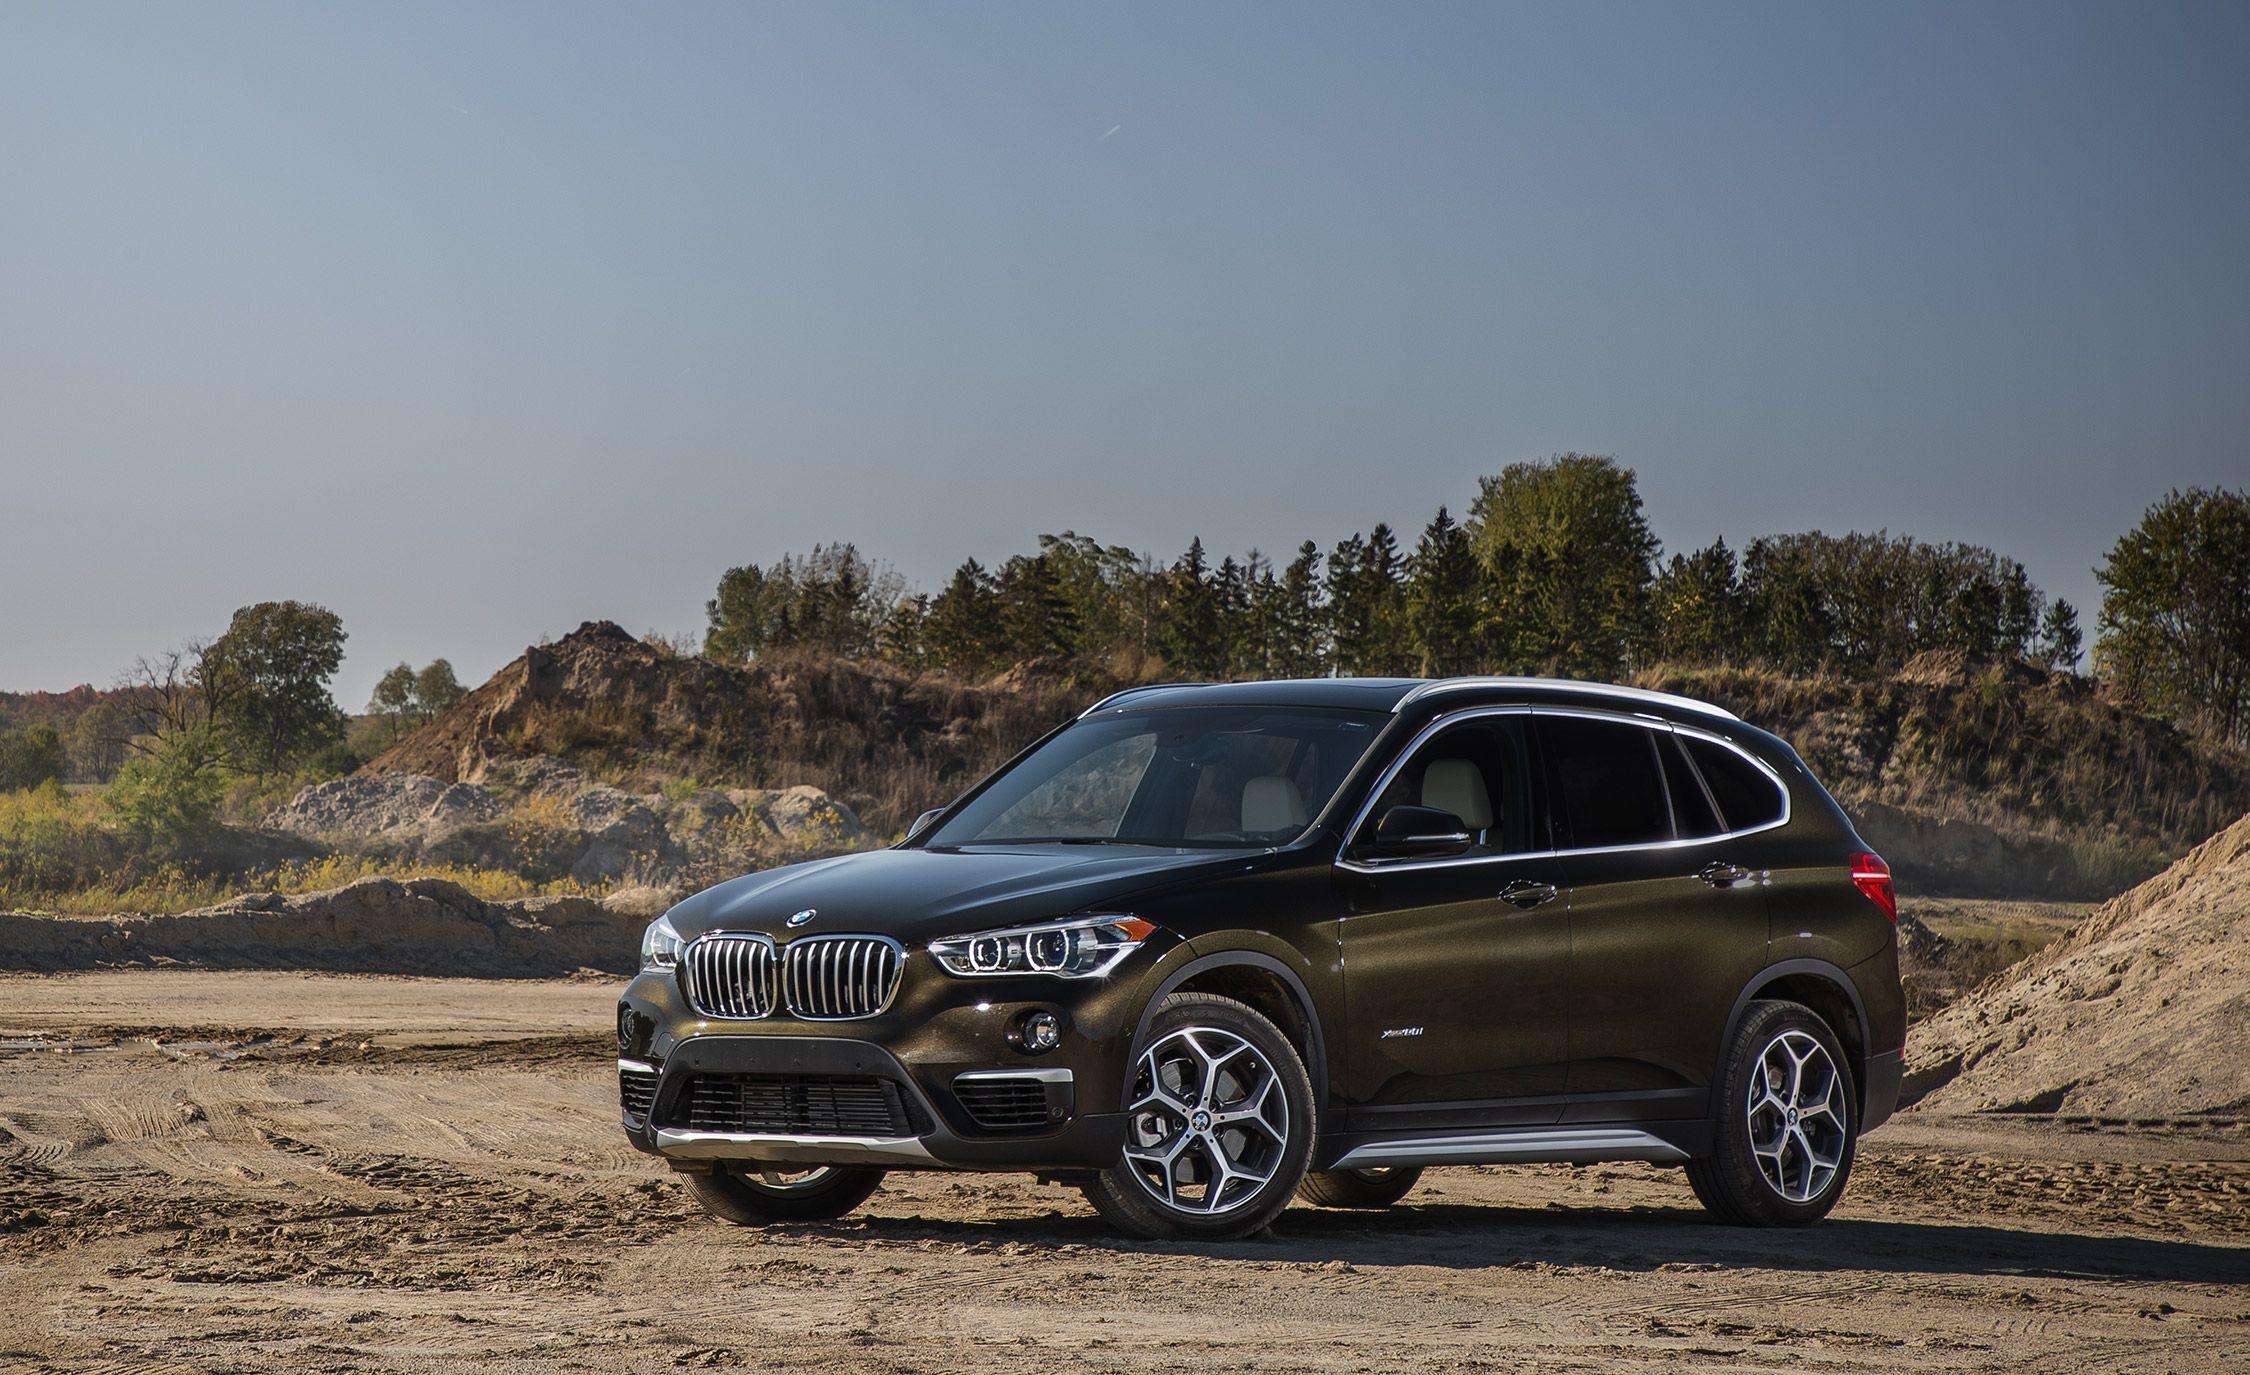 BMW X1: Best Subcompact Luxury SUV